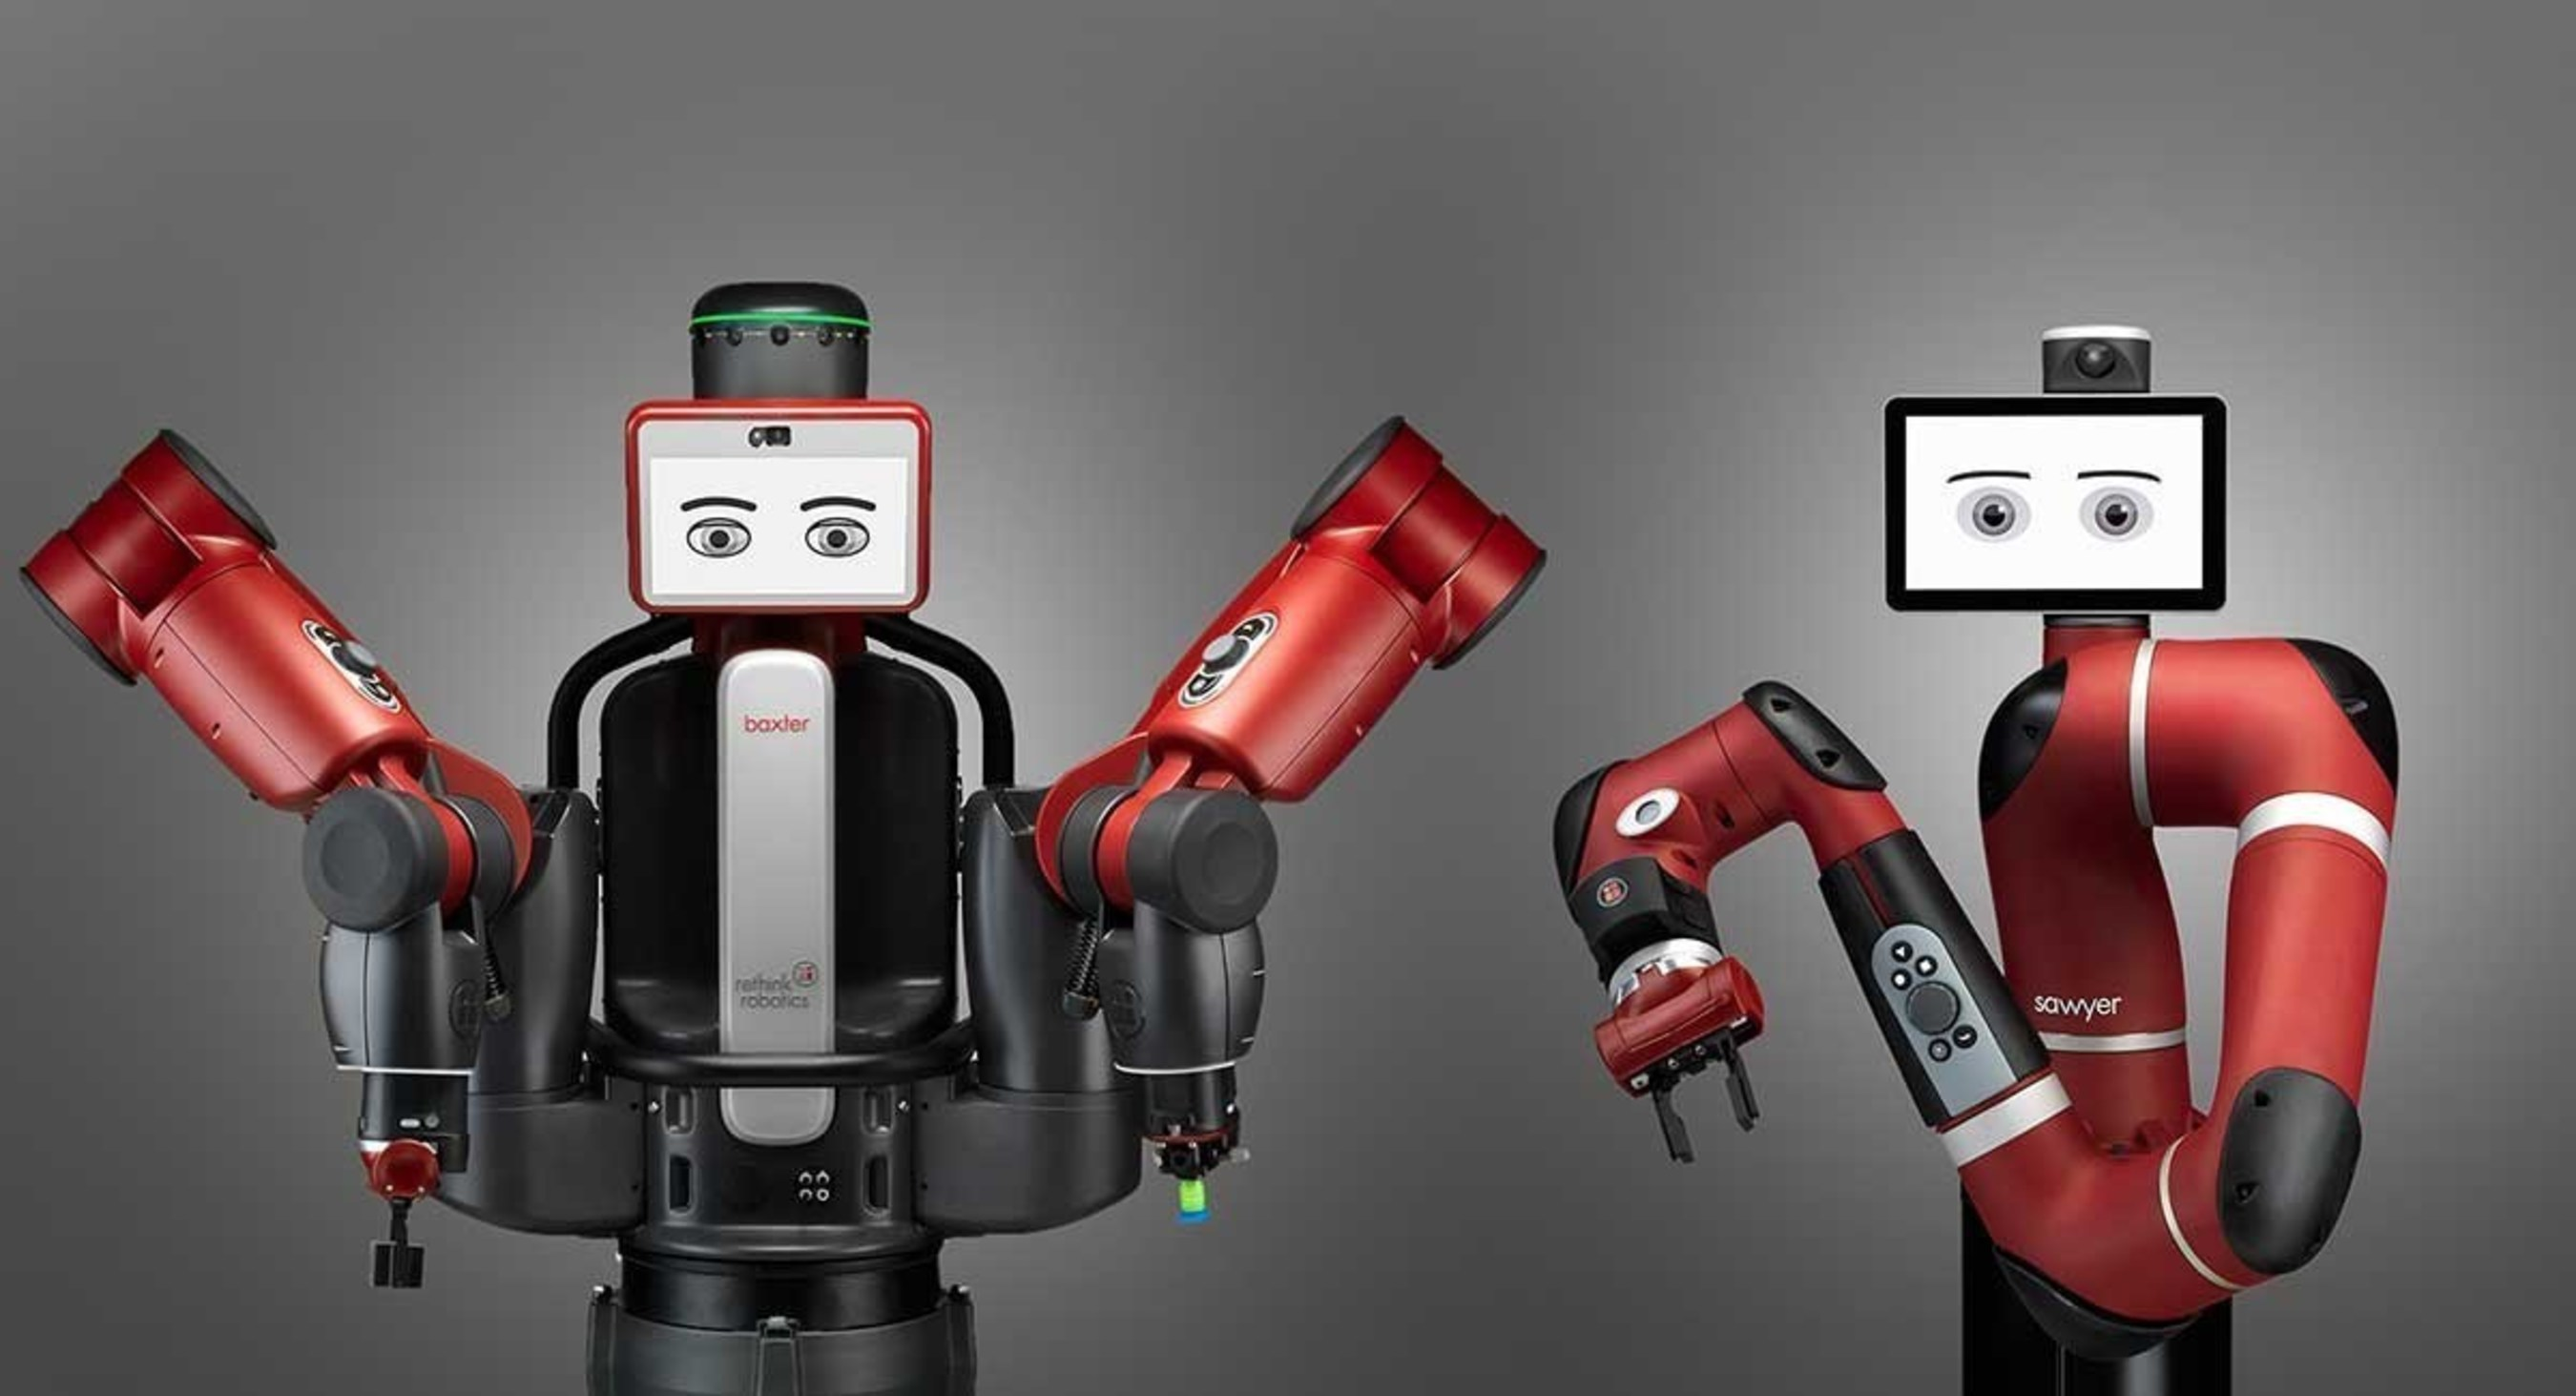 Rethink Robotics' Baxter and Sawyer robots